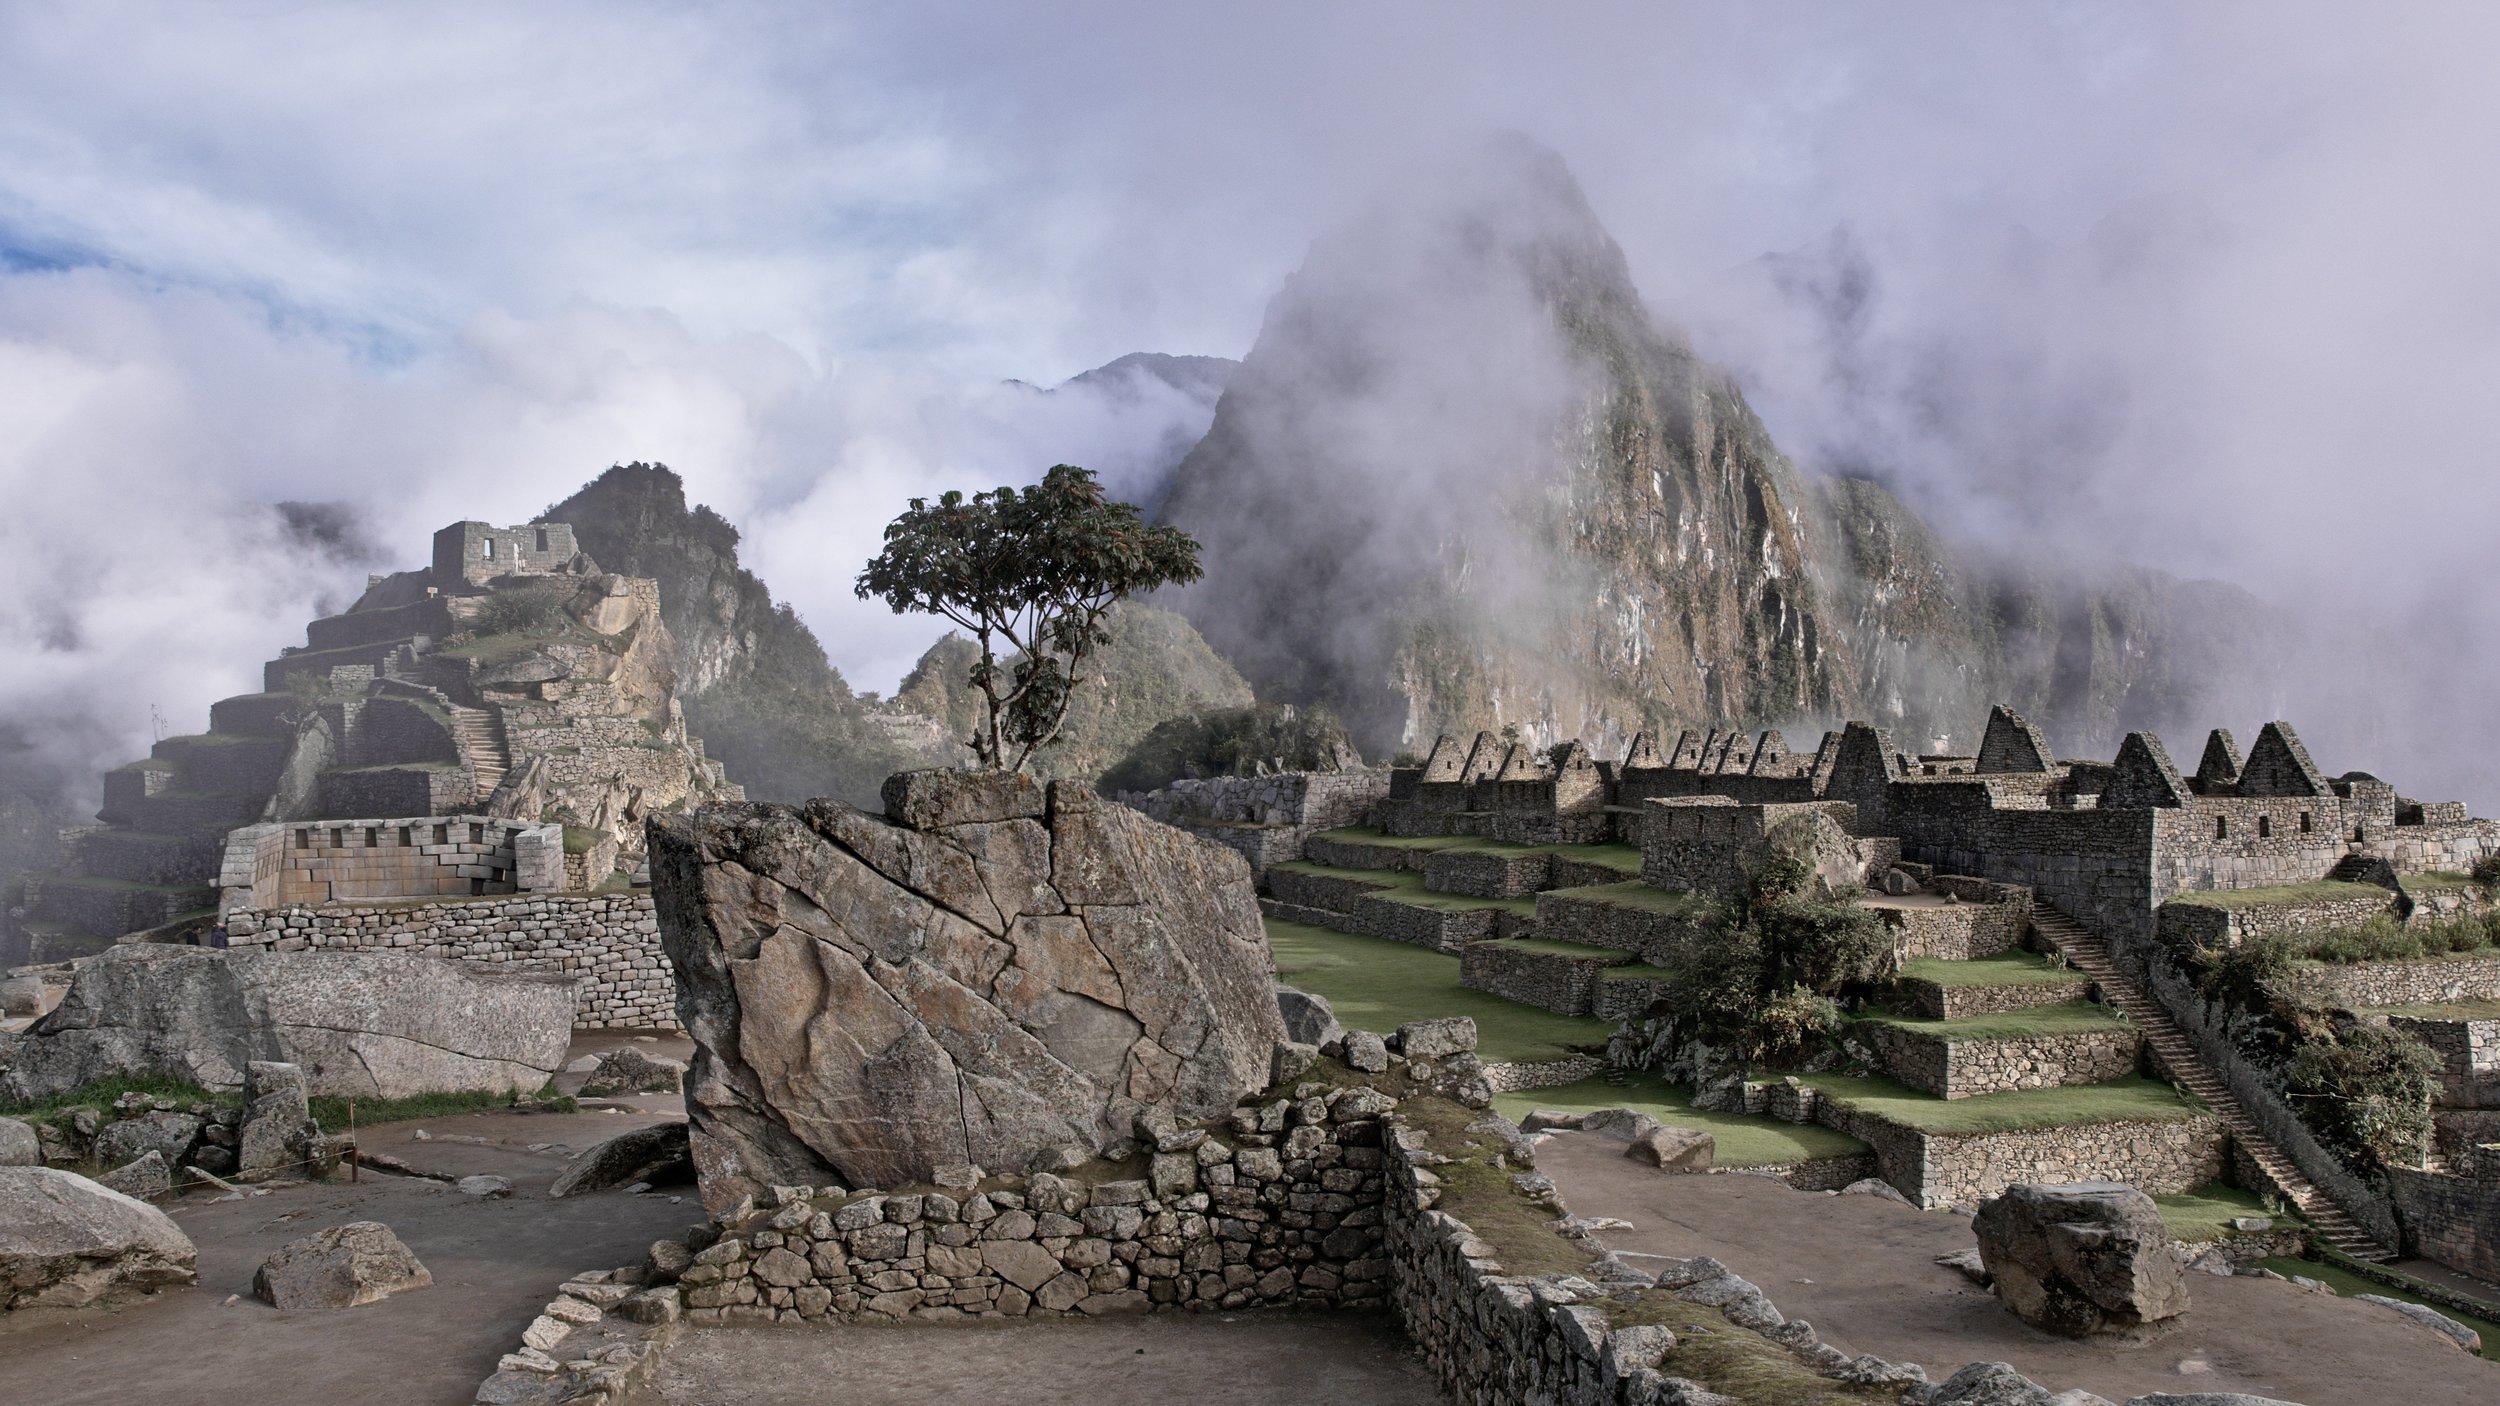 Incan Trail - Coming Soon! -